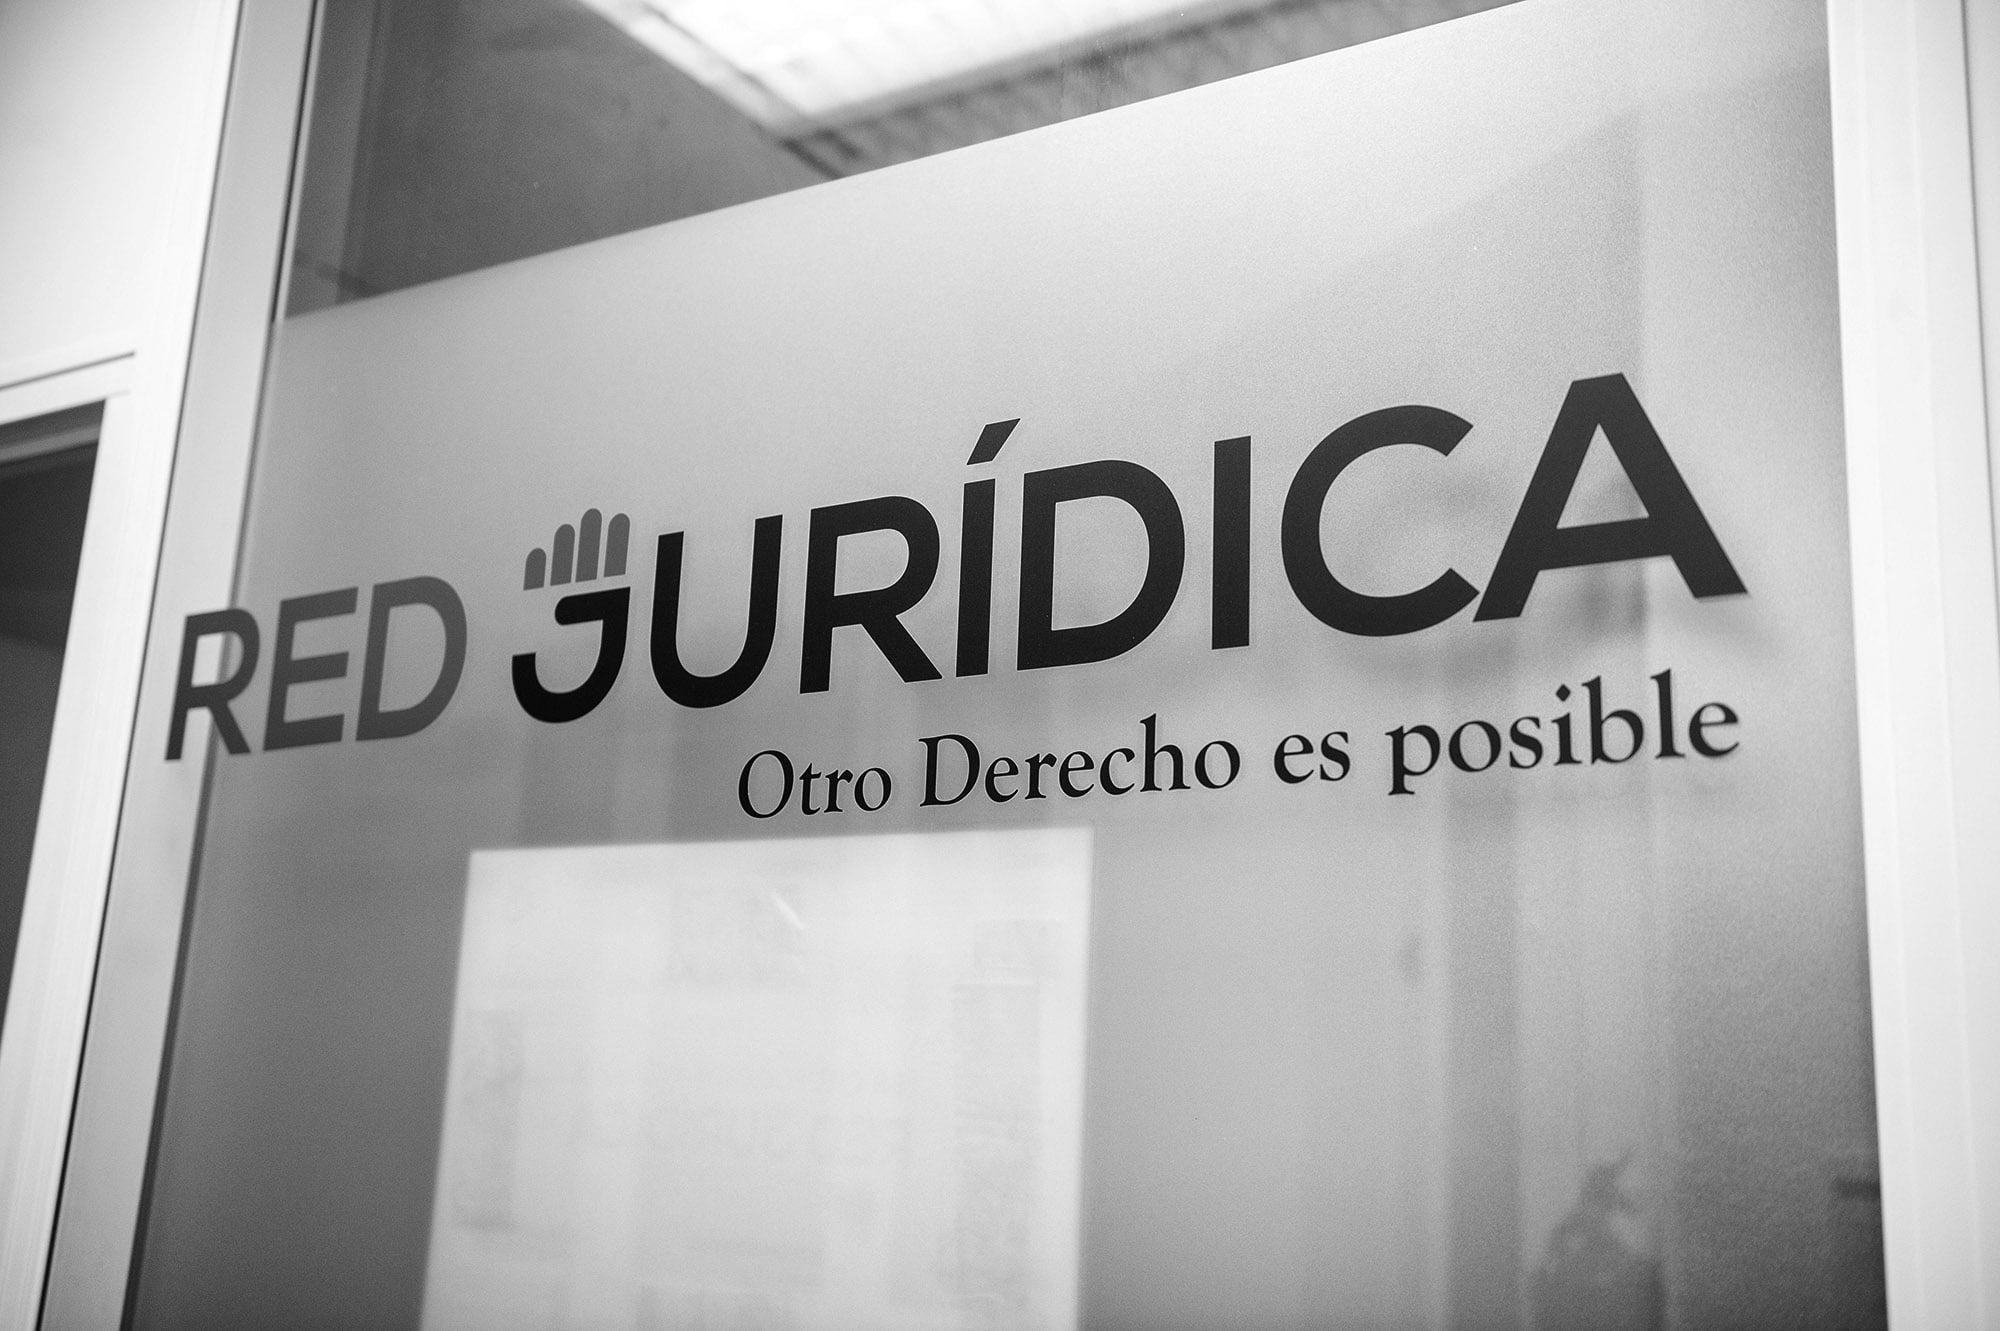 Red Juridica Detalle 5